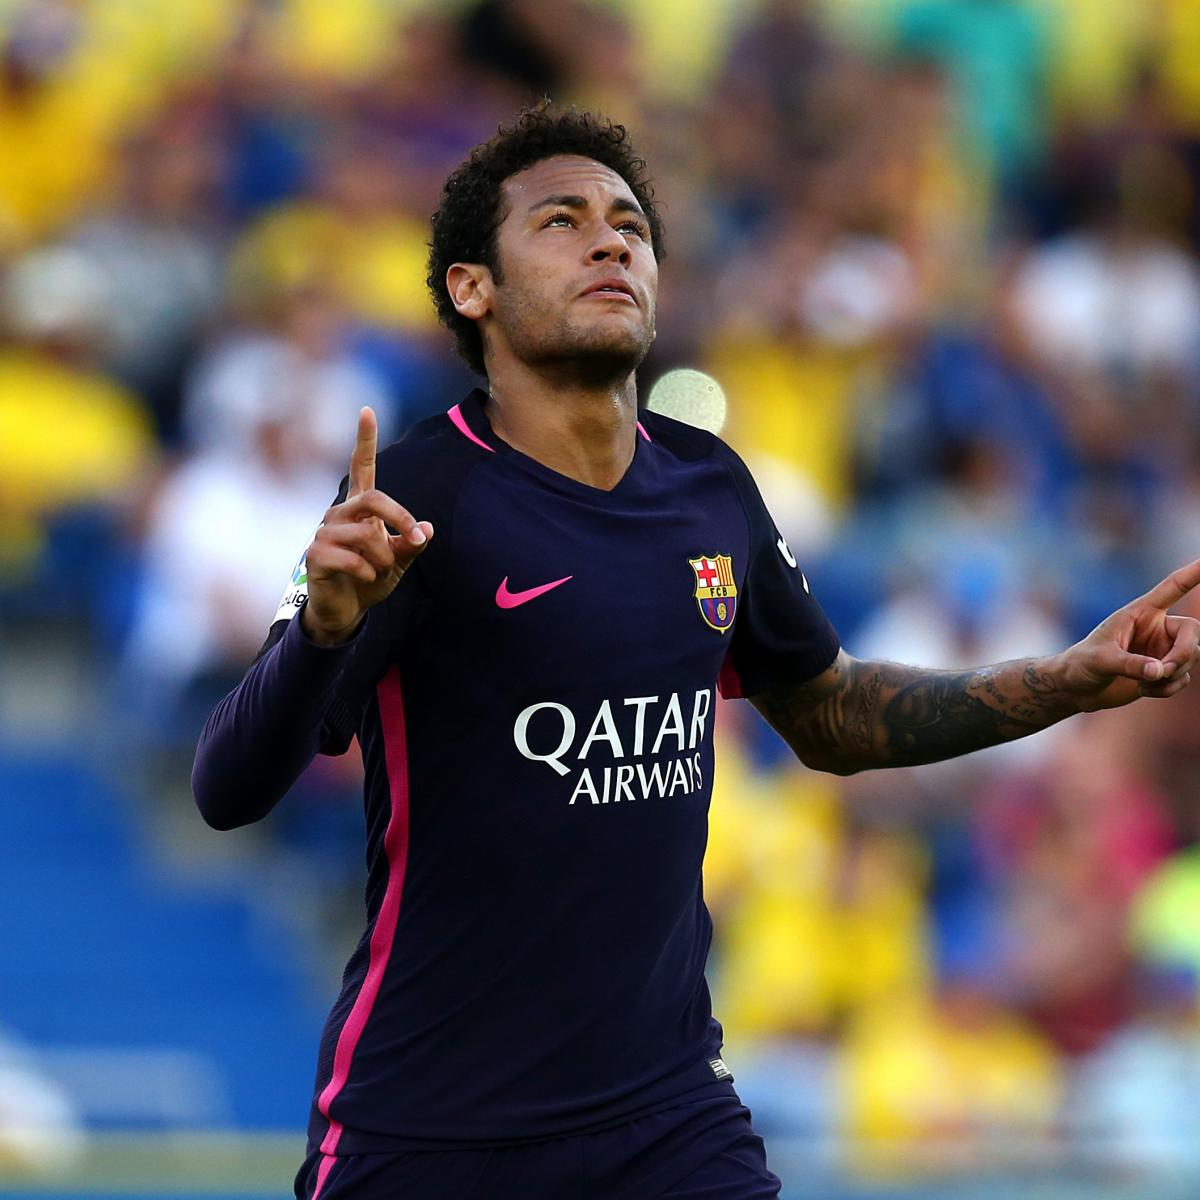 Celta Vigo Vs Barcelona Predictions Today: Barcelona Vs. Eibar: Team News, Preview, Live Stream And